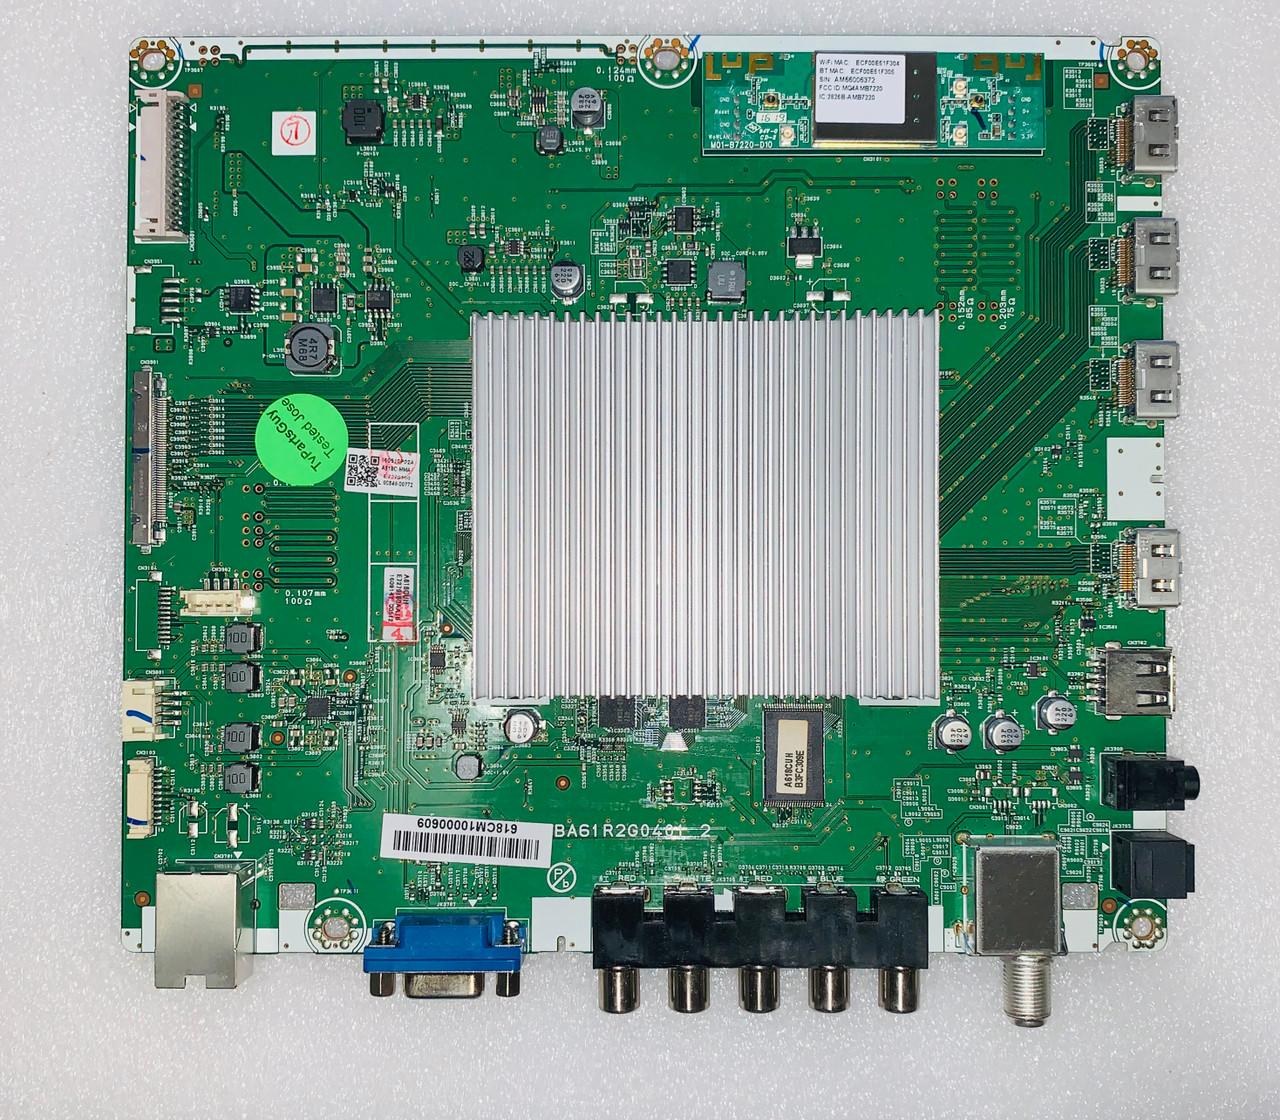 Philips 65PFL6621/F7 Main board BA61R2G04012 / A618C-MMA / A618CUH